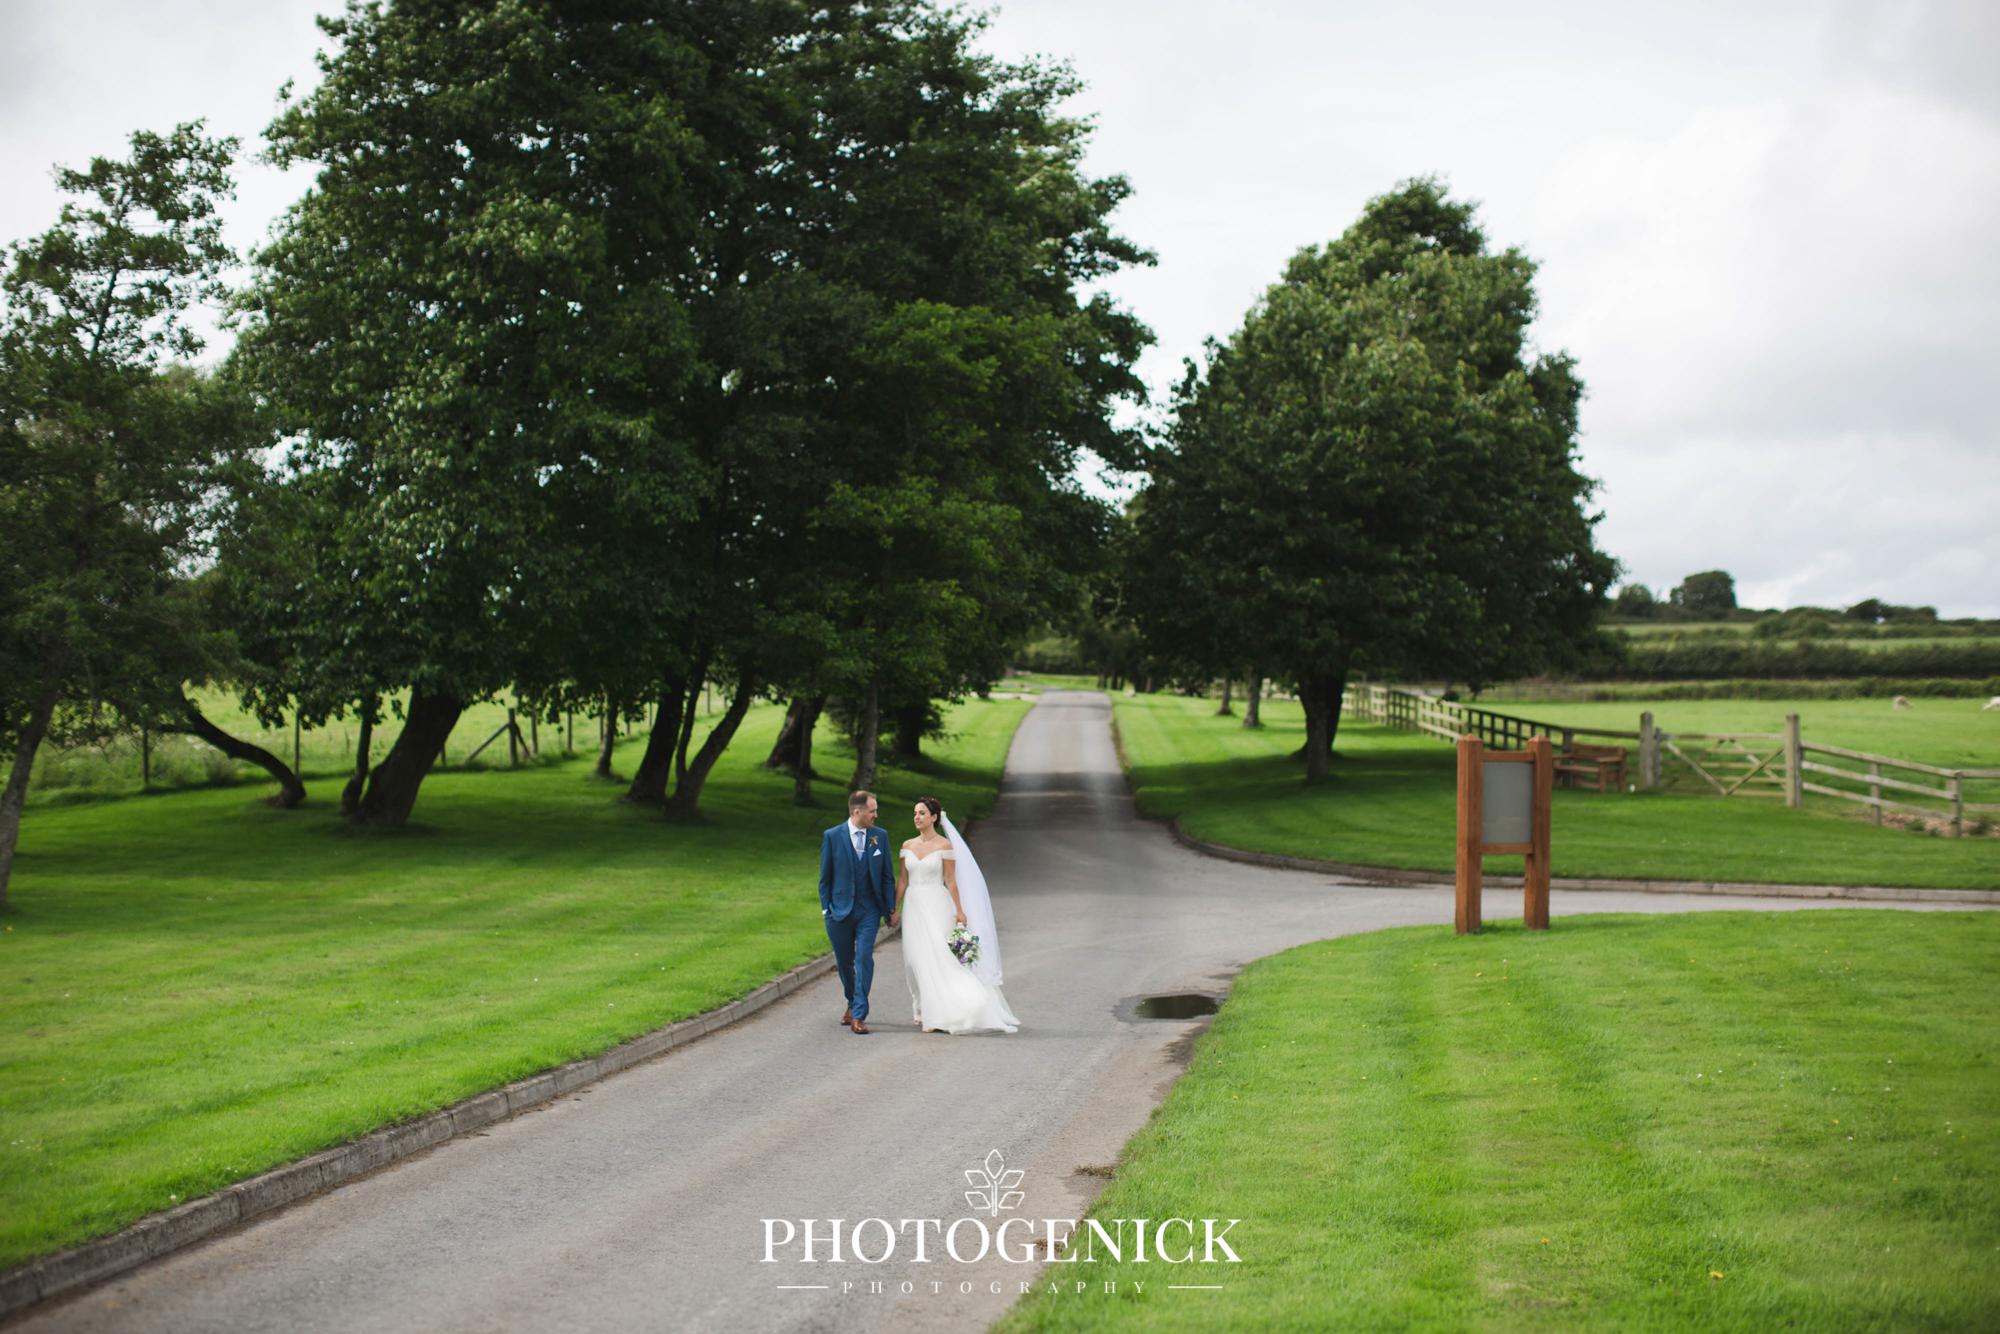 oldwalls gower wedding photographers-45.jpg